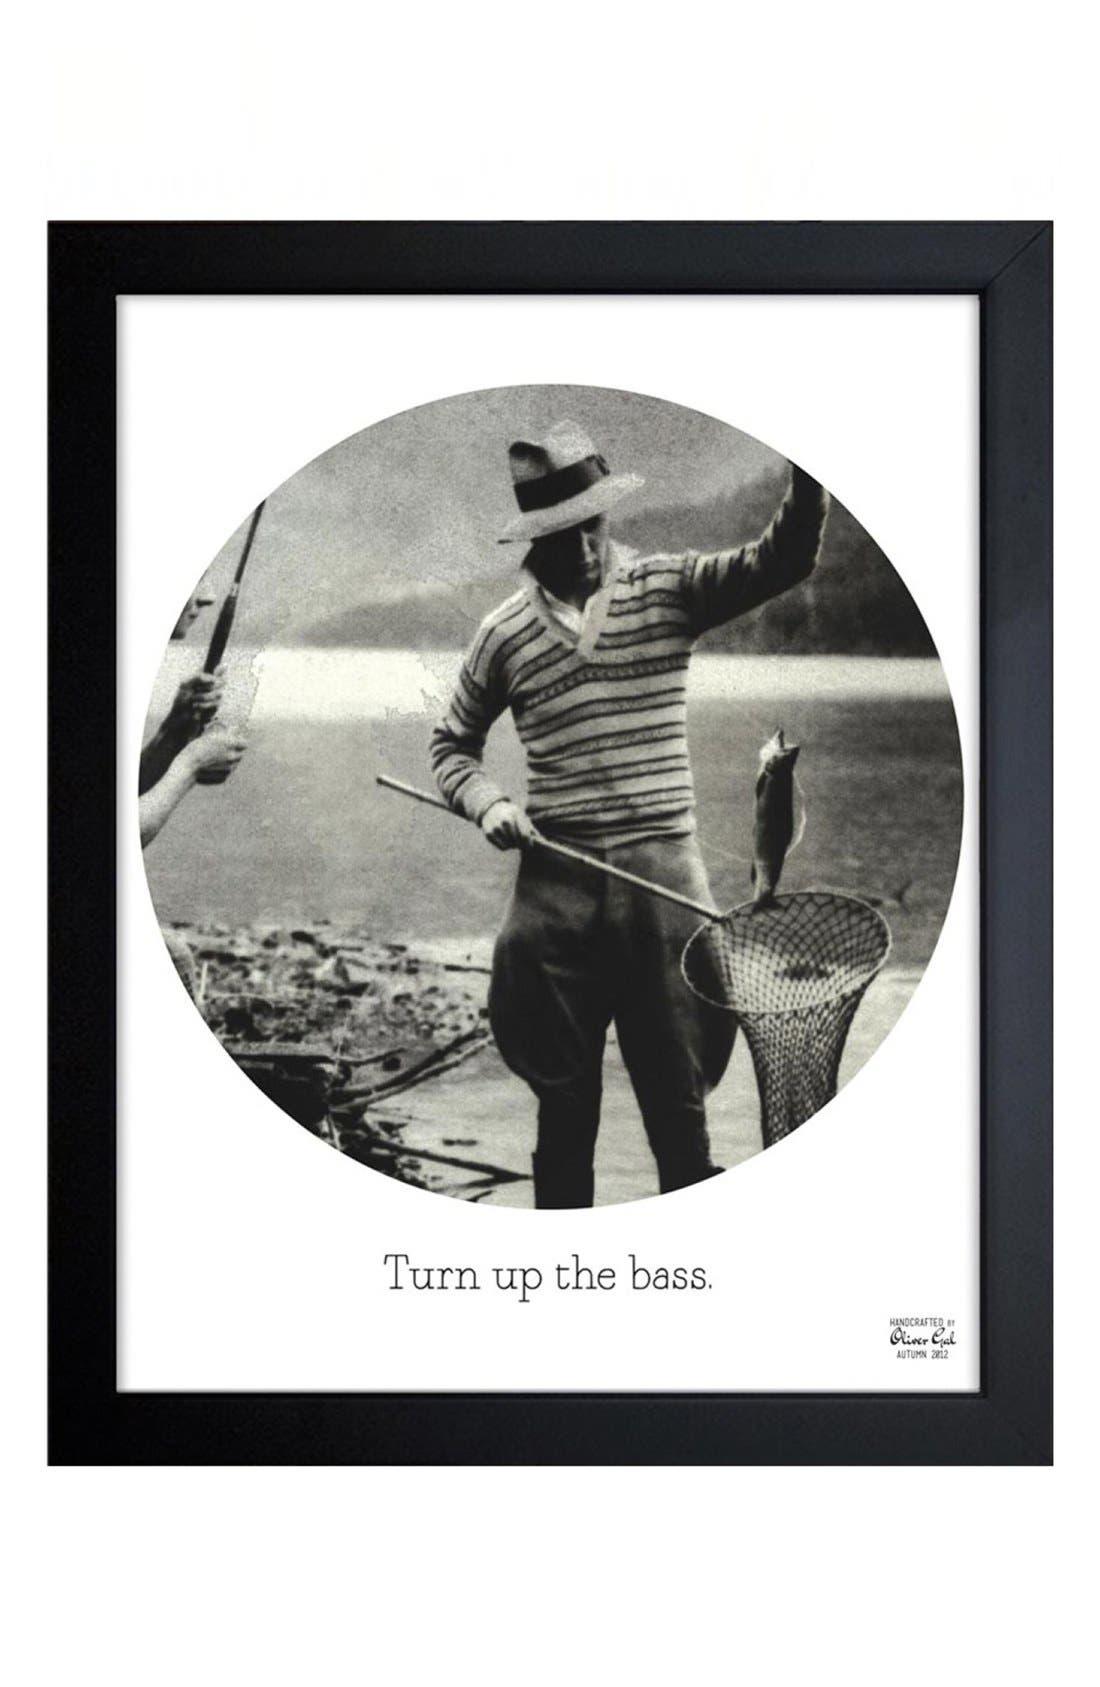 Alternate Image 1 Selected - Oliver Gal 'Turn Up the Bass' Framed Print